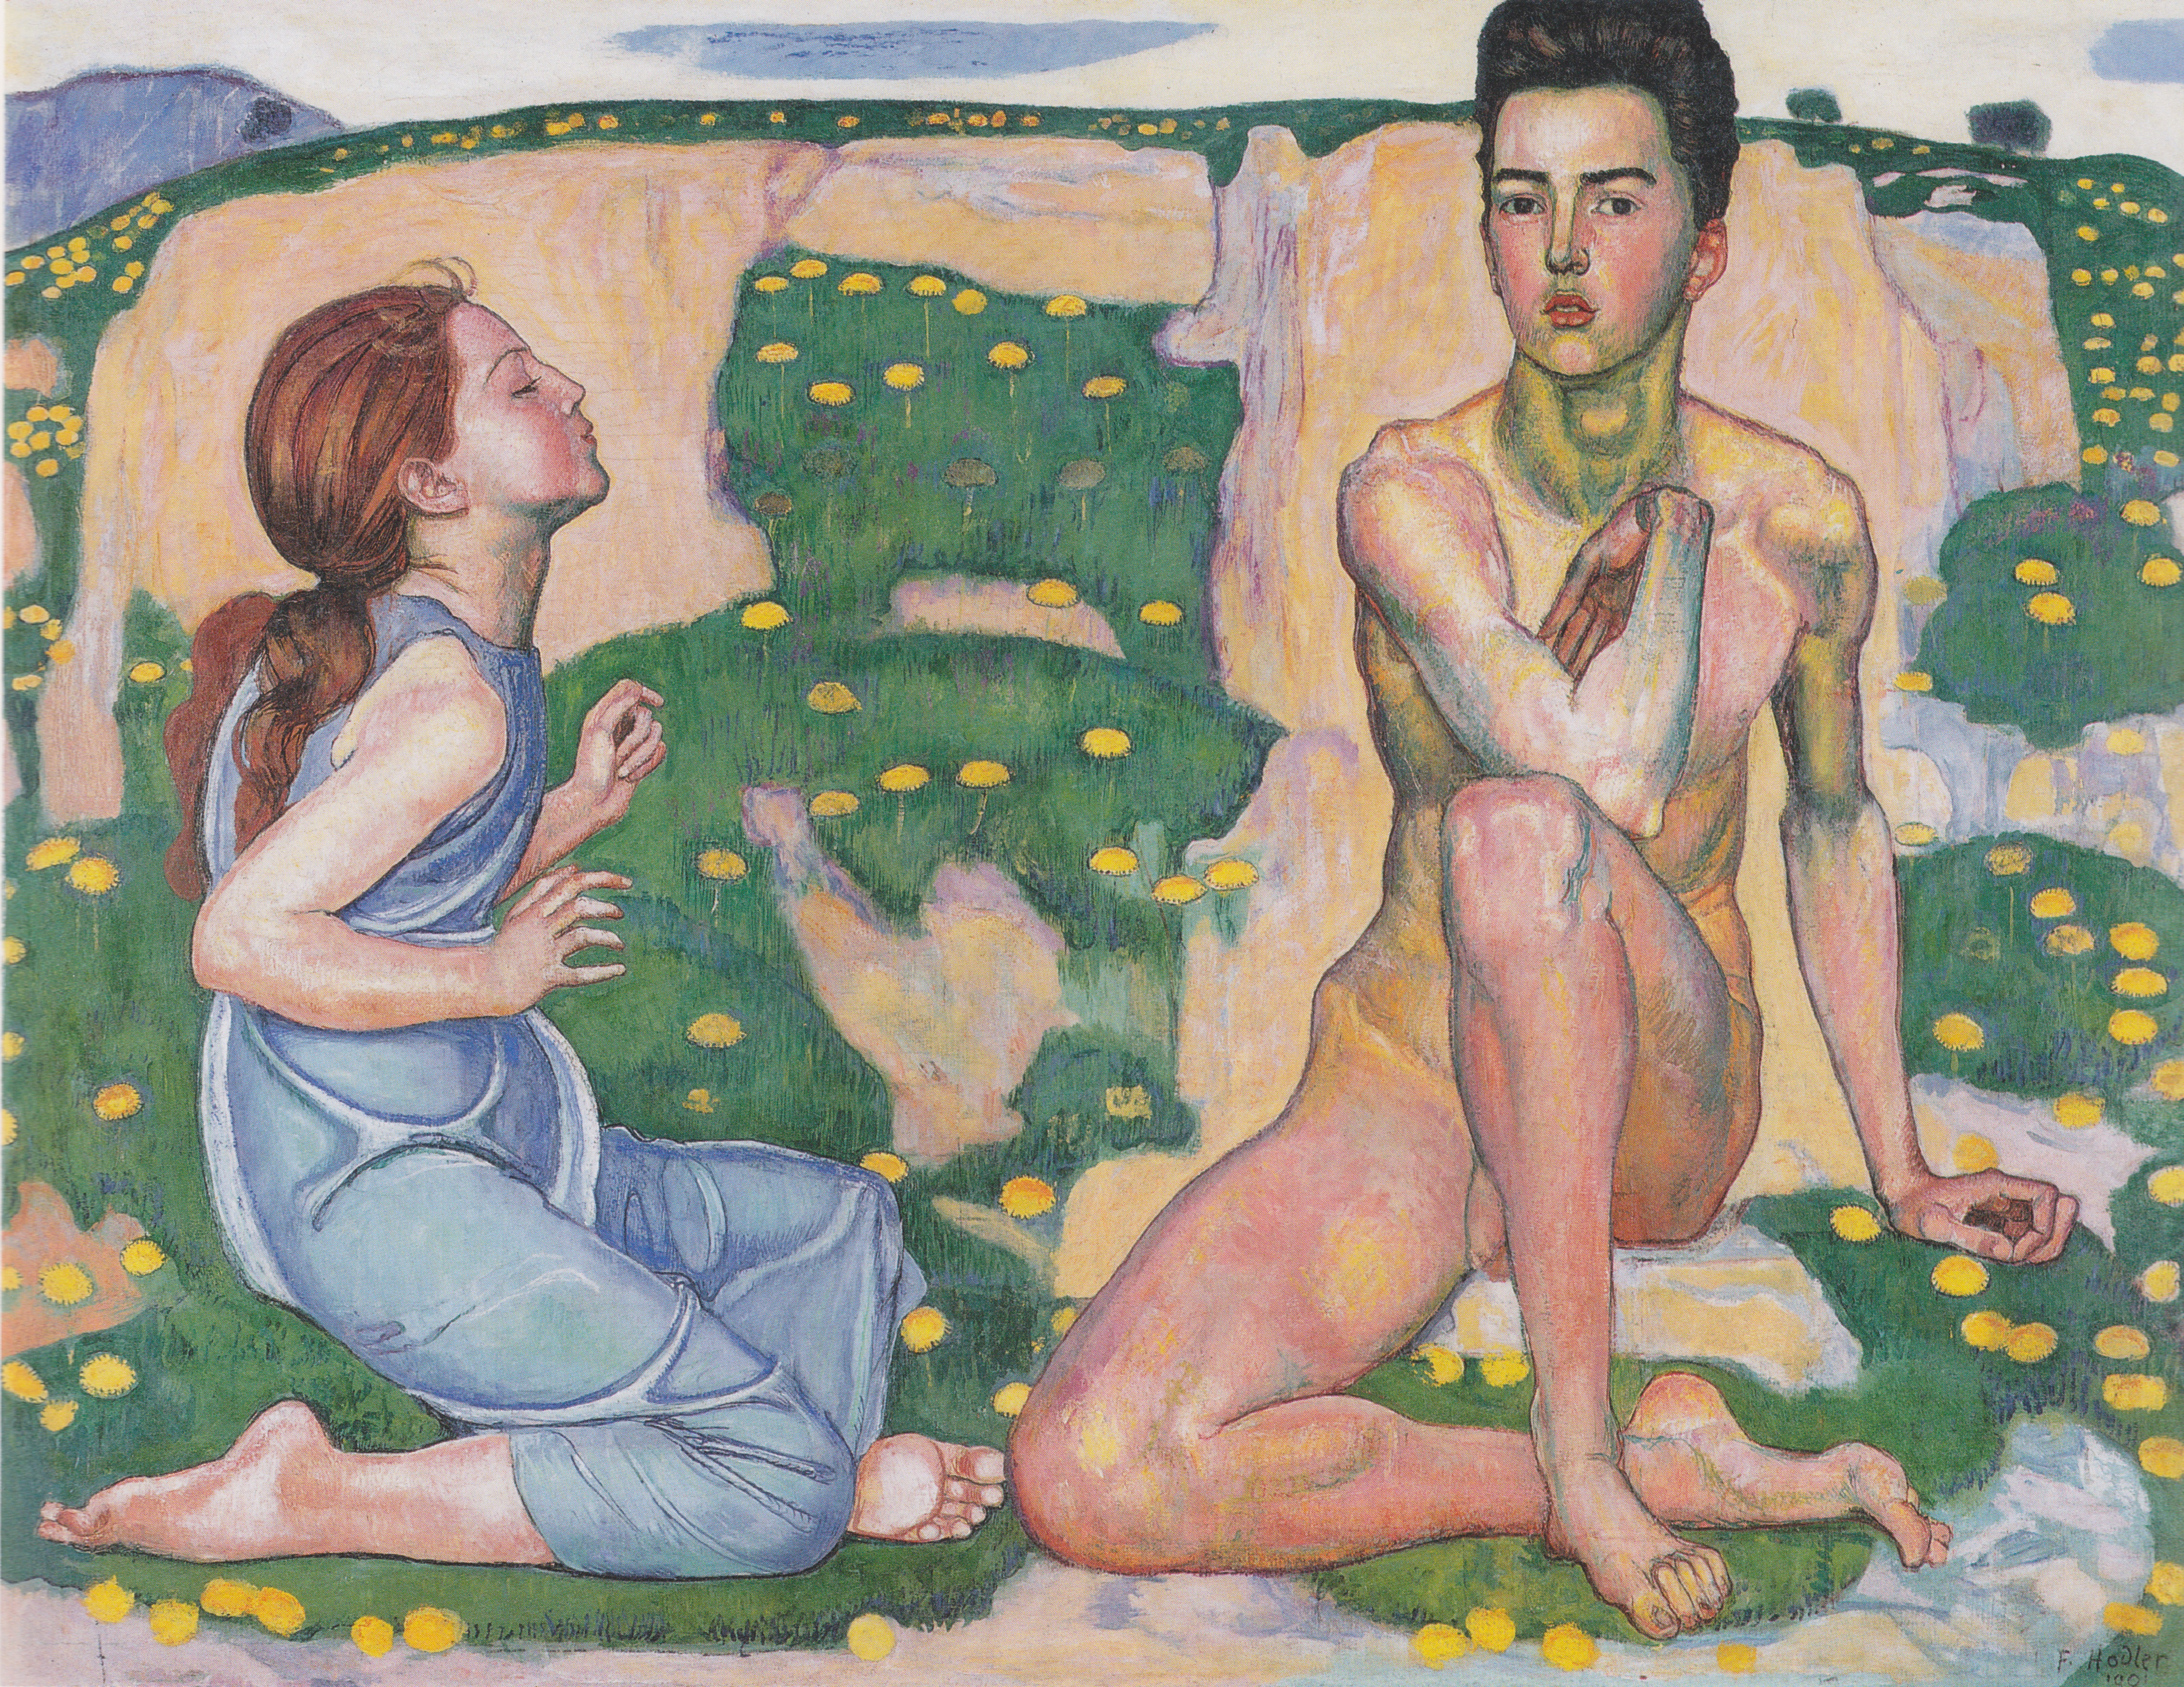 Spring, Ferdinand Hodler, 1901